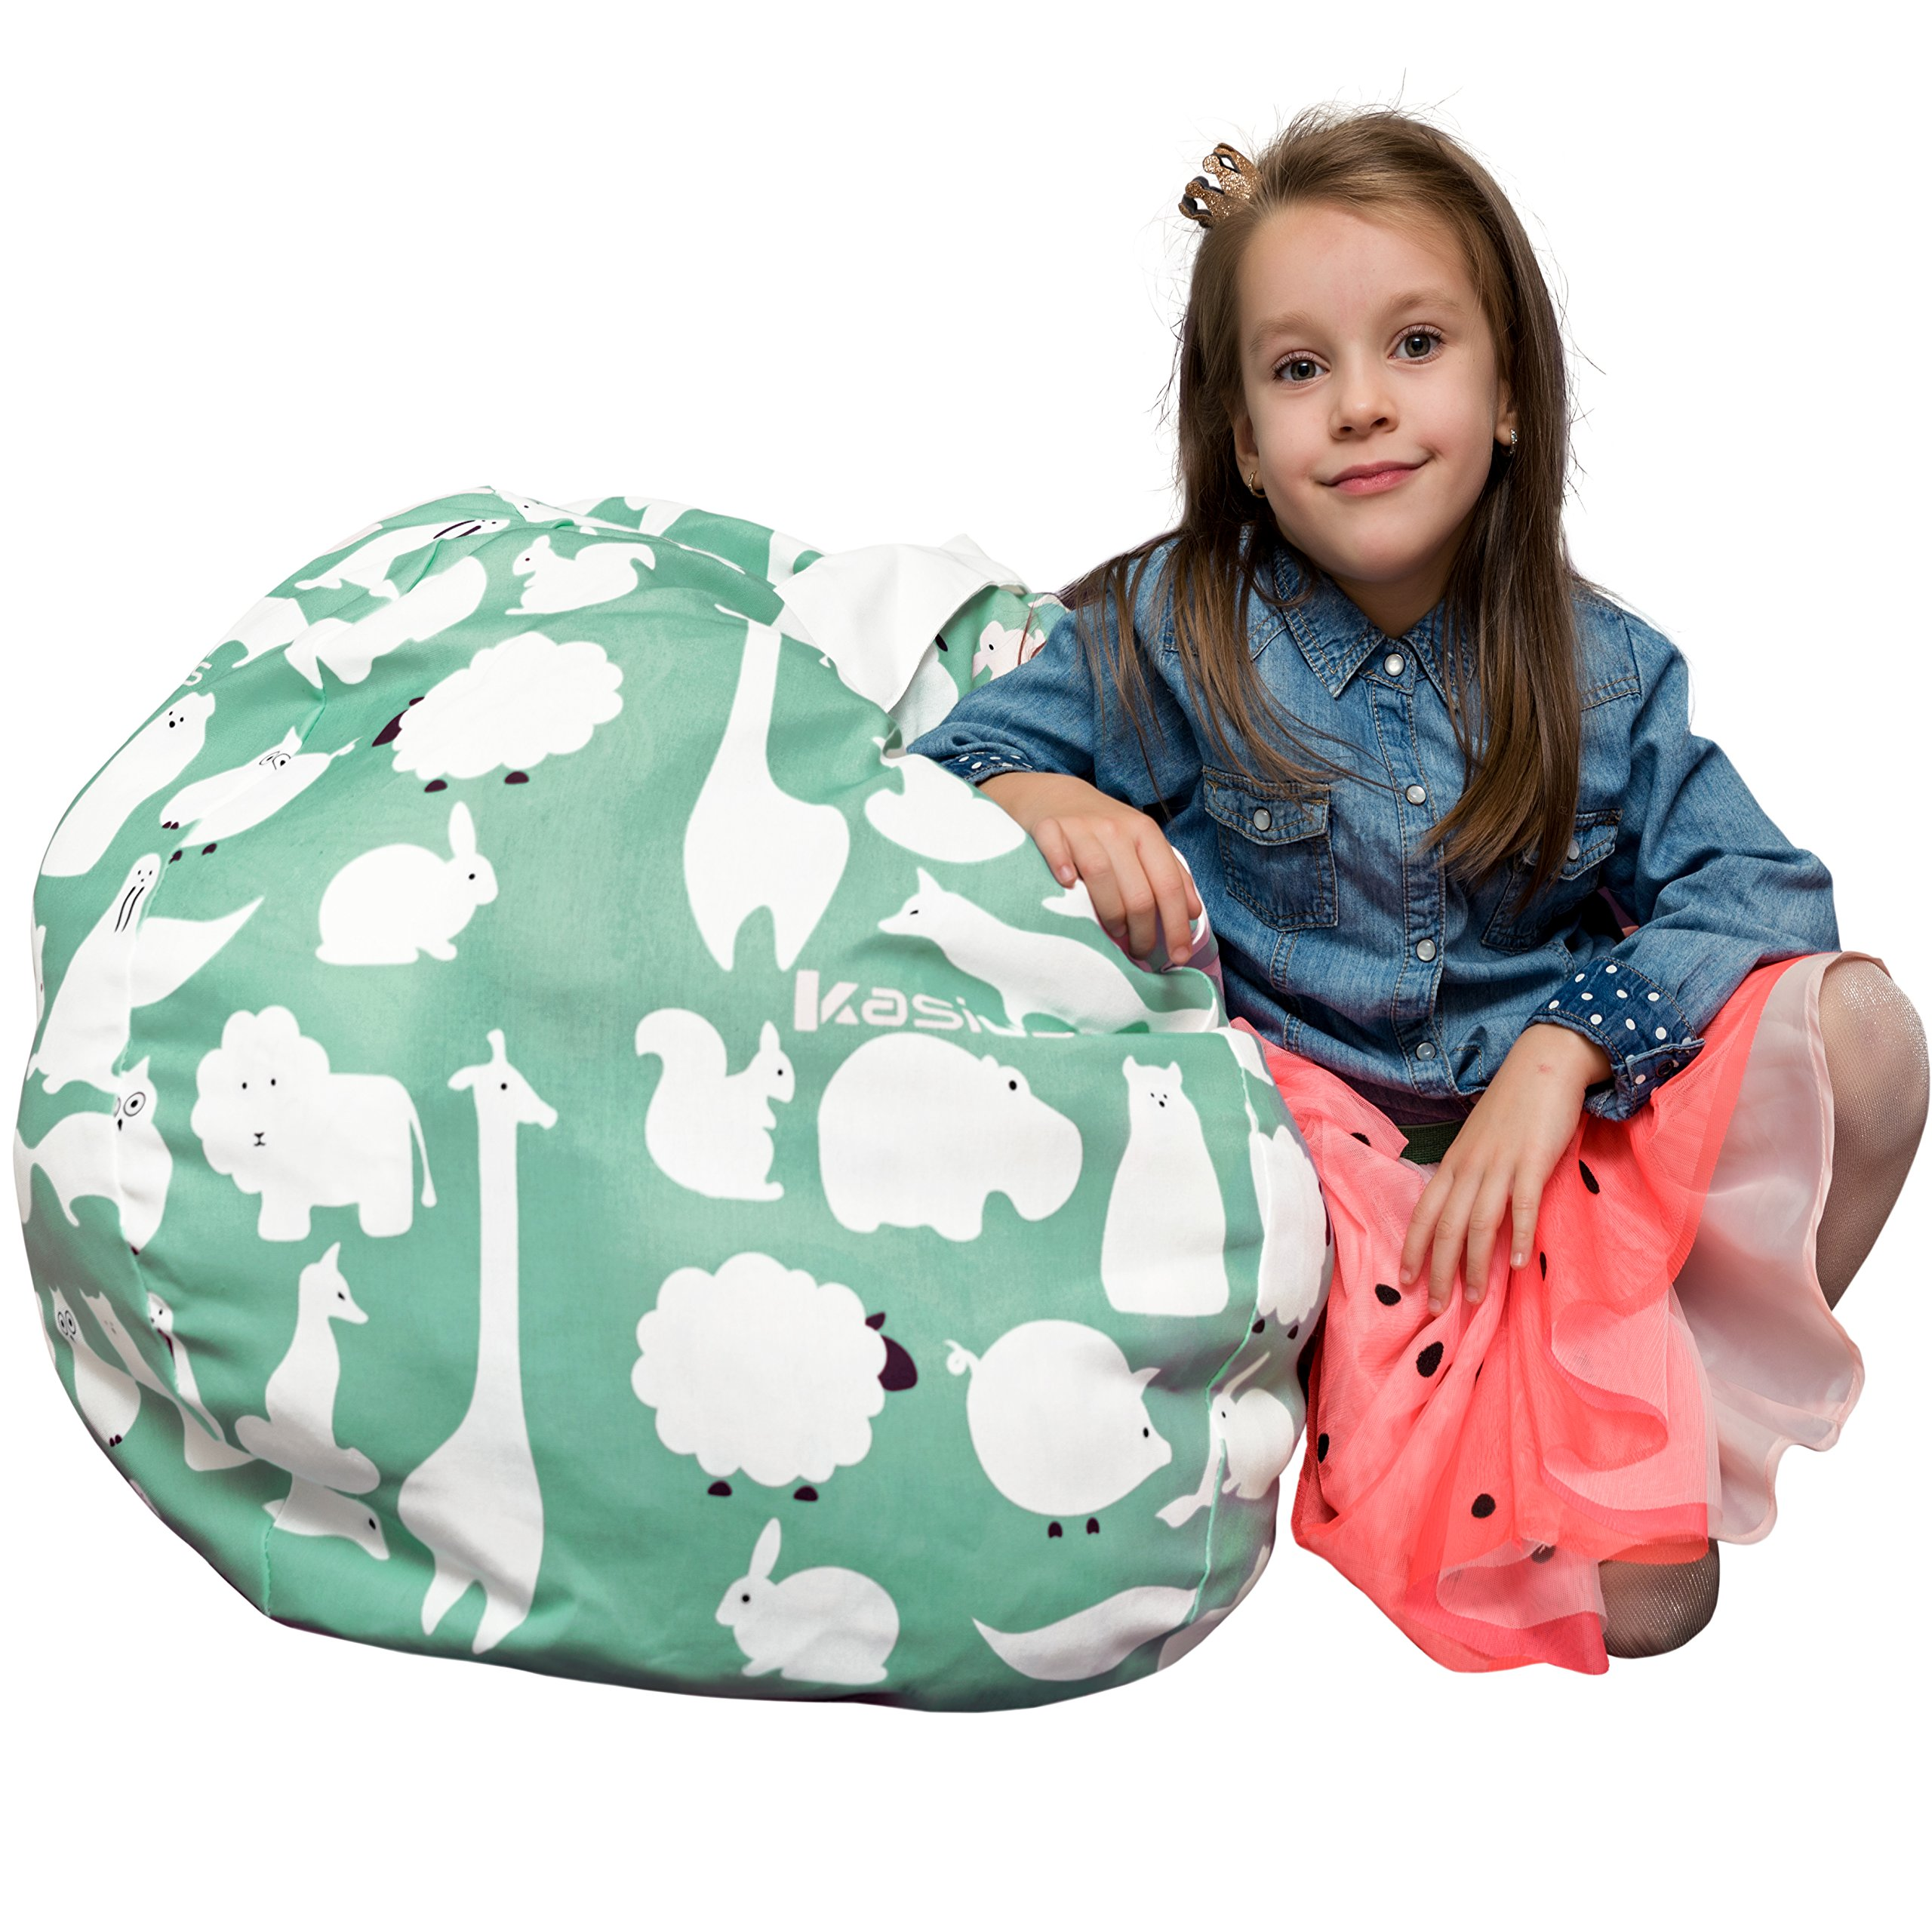 Bean Bag Stuffed Animal Storage - Improved Toy Organizer Design - Better than Stuff Animal Hammock - Extra Large - Stuffed Animal Holder - for Kids and Teens